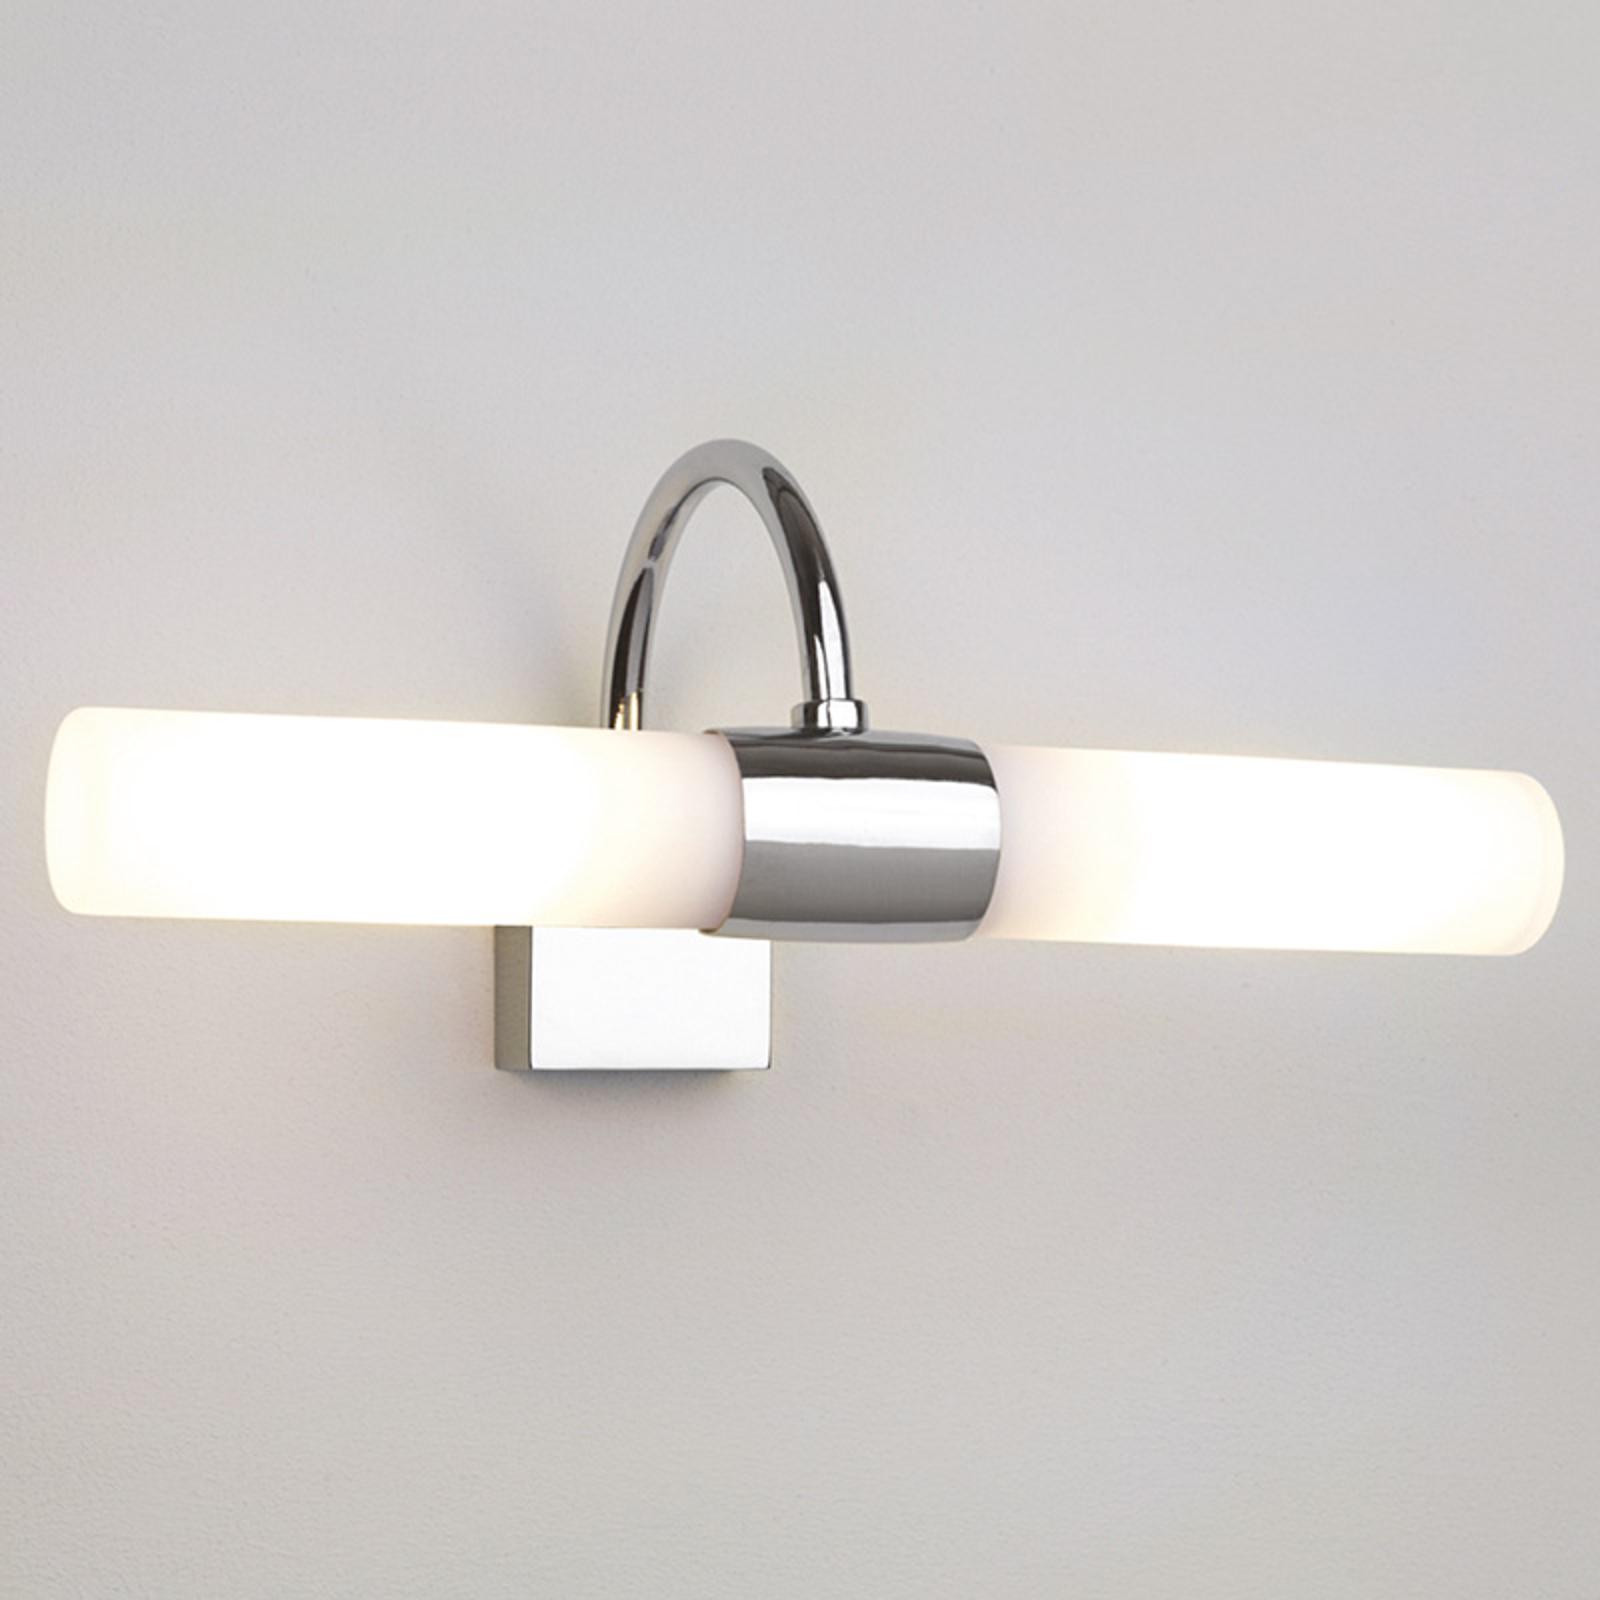 Dayton Wall Light for the Mirror White_1020020_1